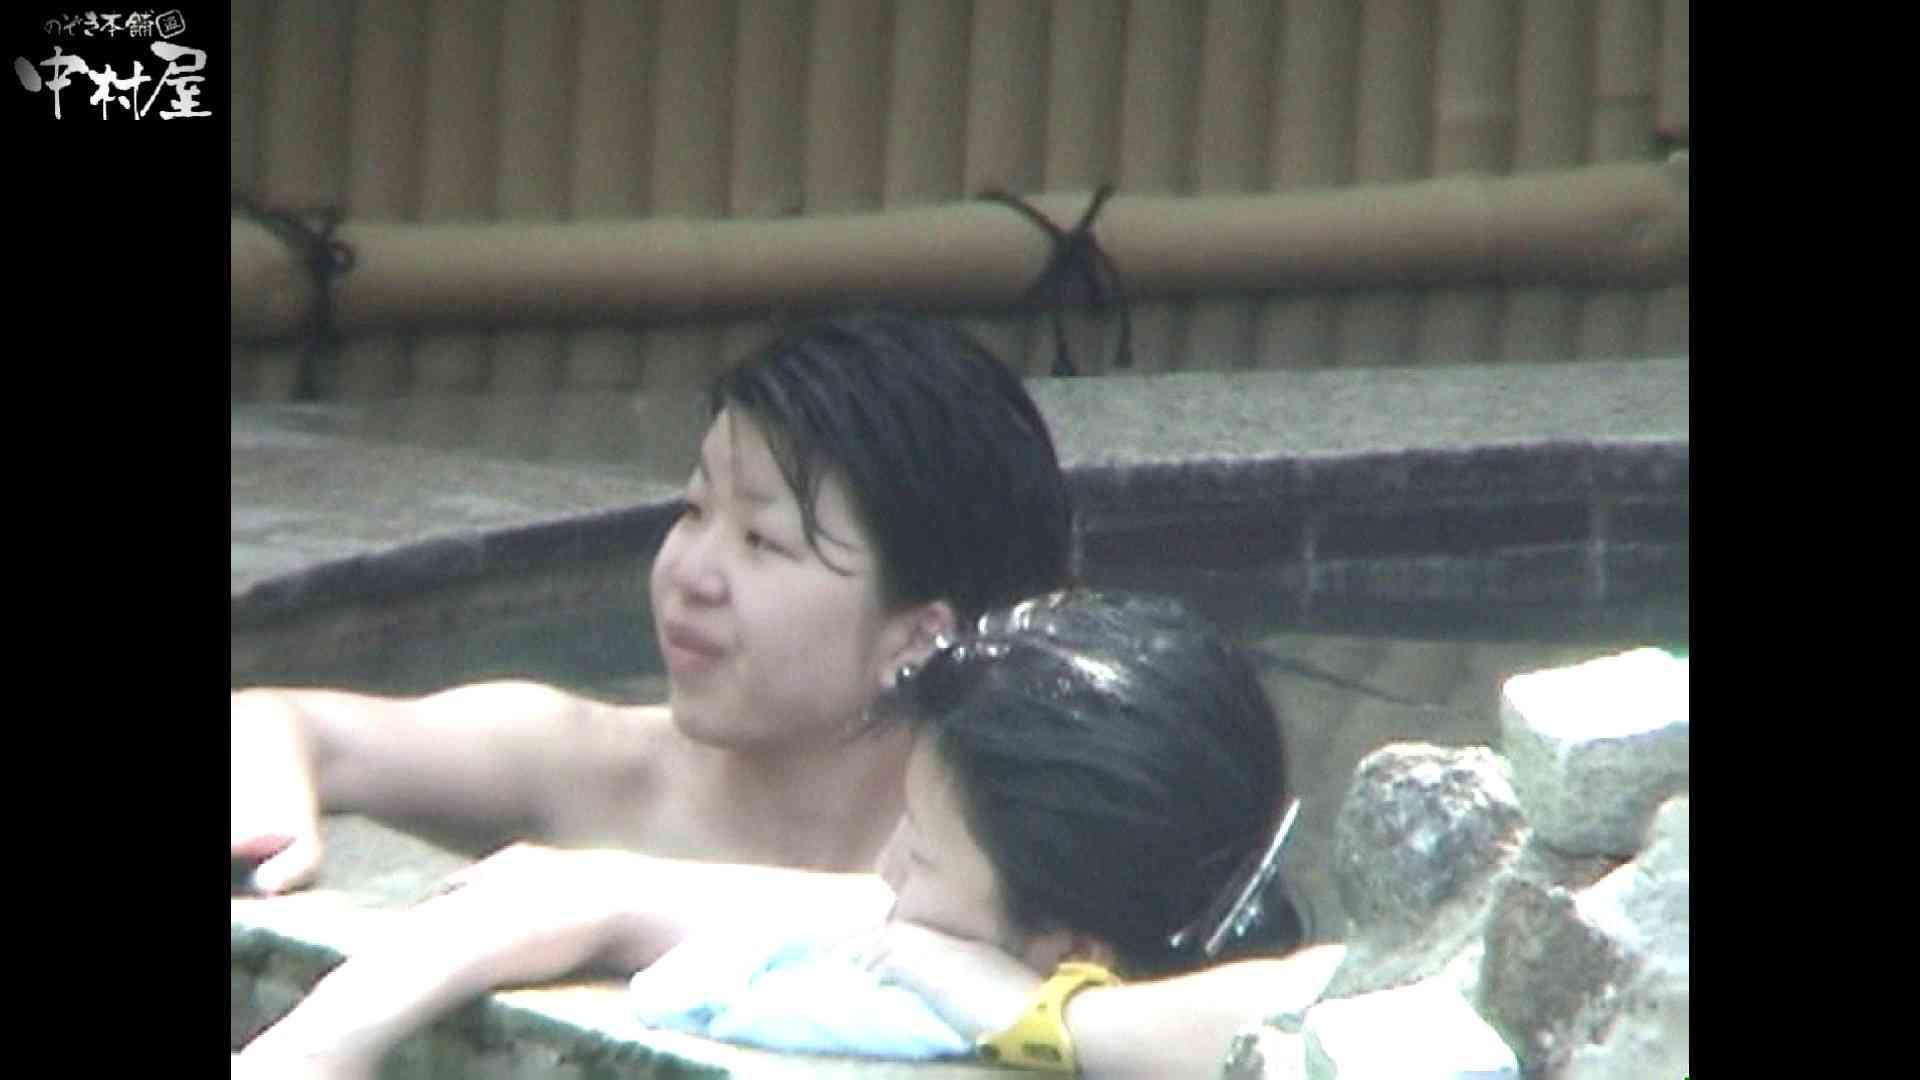 Aquaな露天風呂Vol.936 0  85連発 32